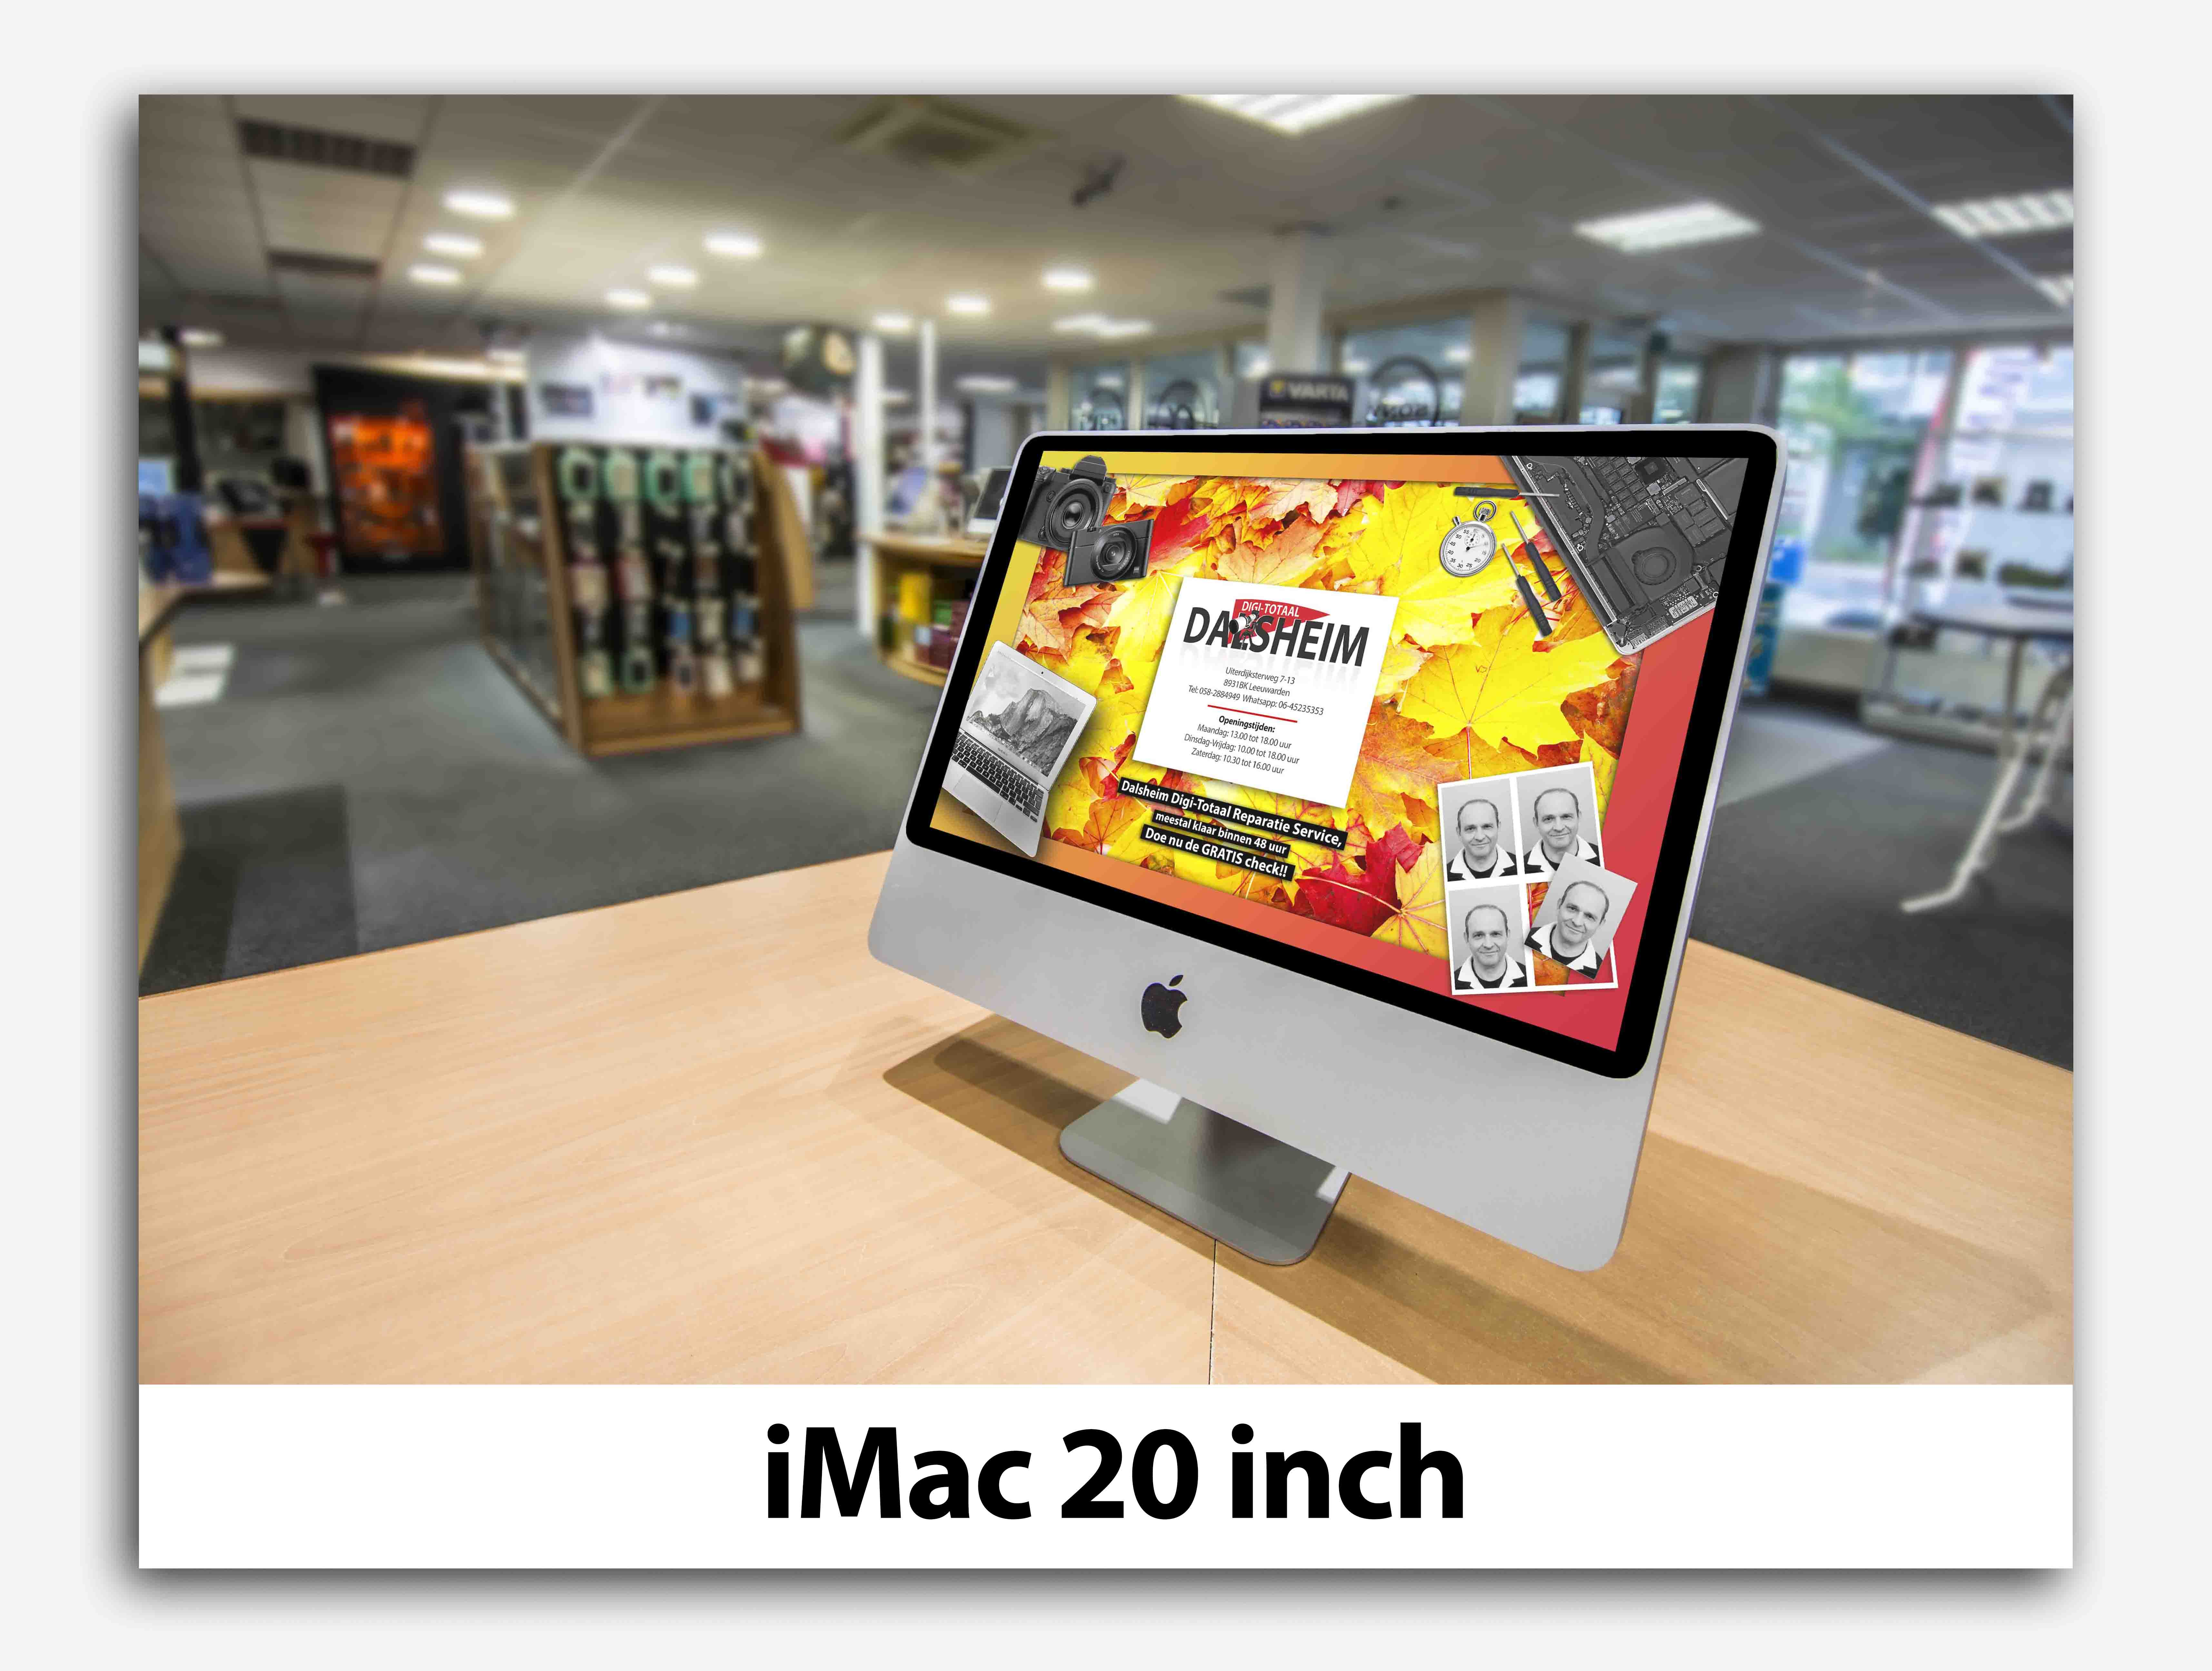 iMac 20 inch apple dalsheim digi-totaal leeuwarden